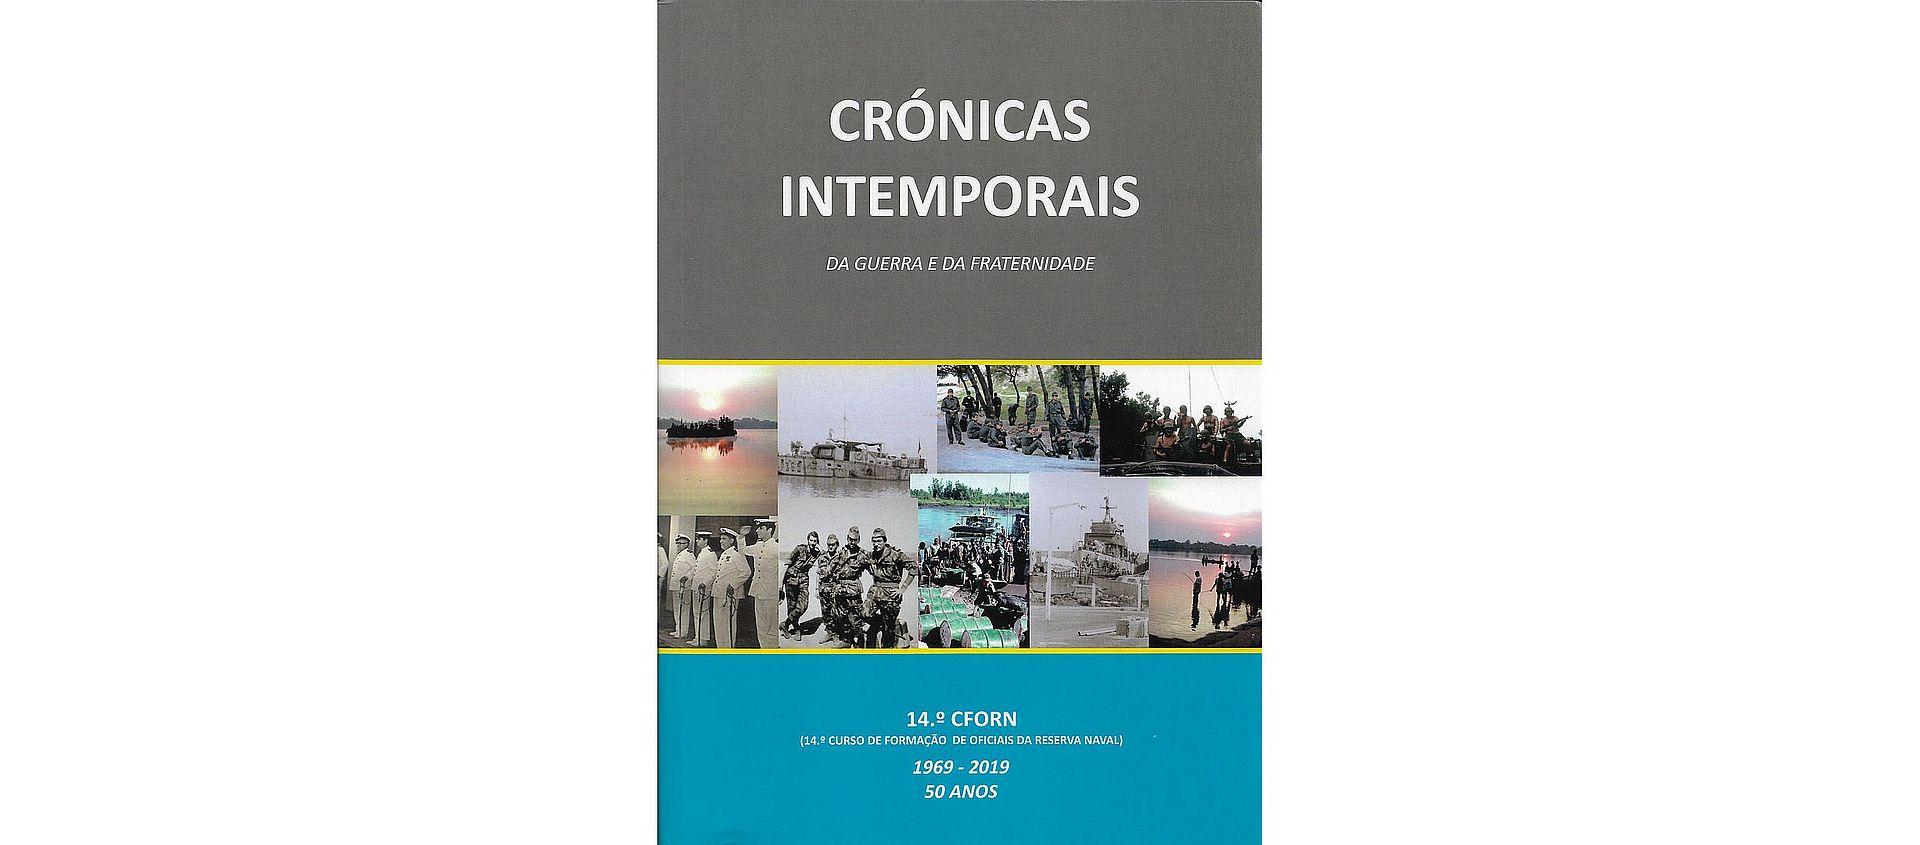 Crónicas Intemporais – Da Guerra e da Fraternidade